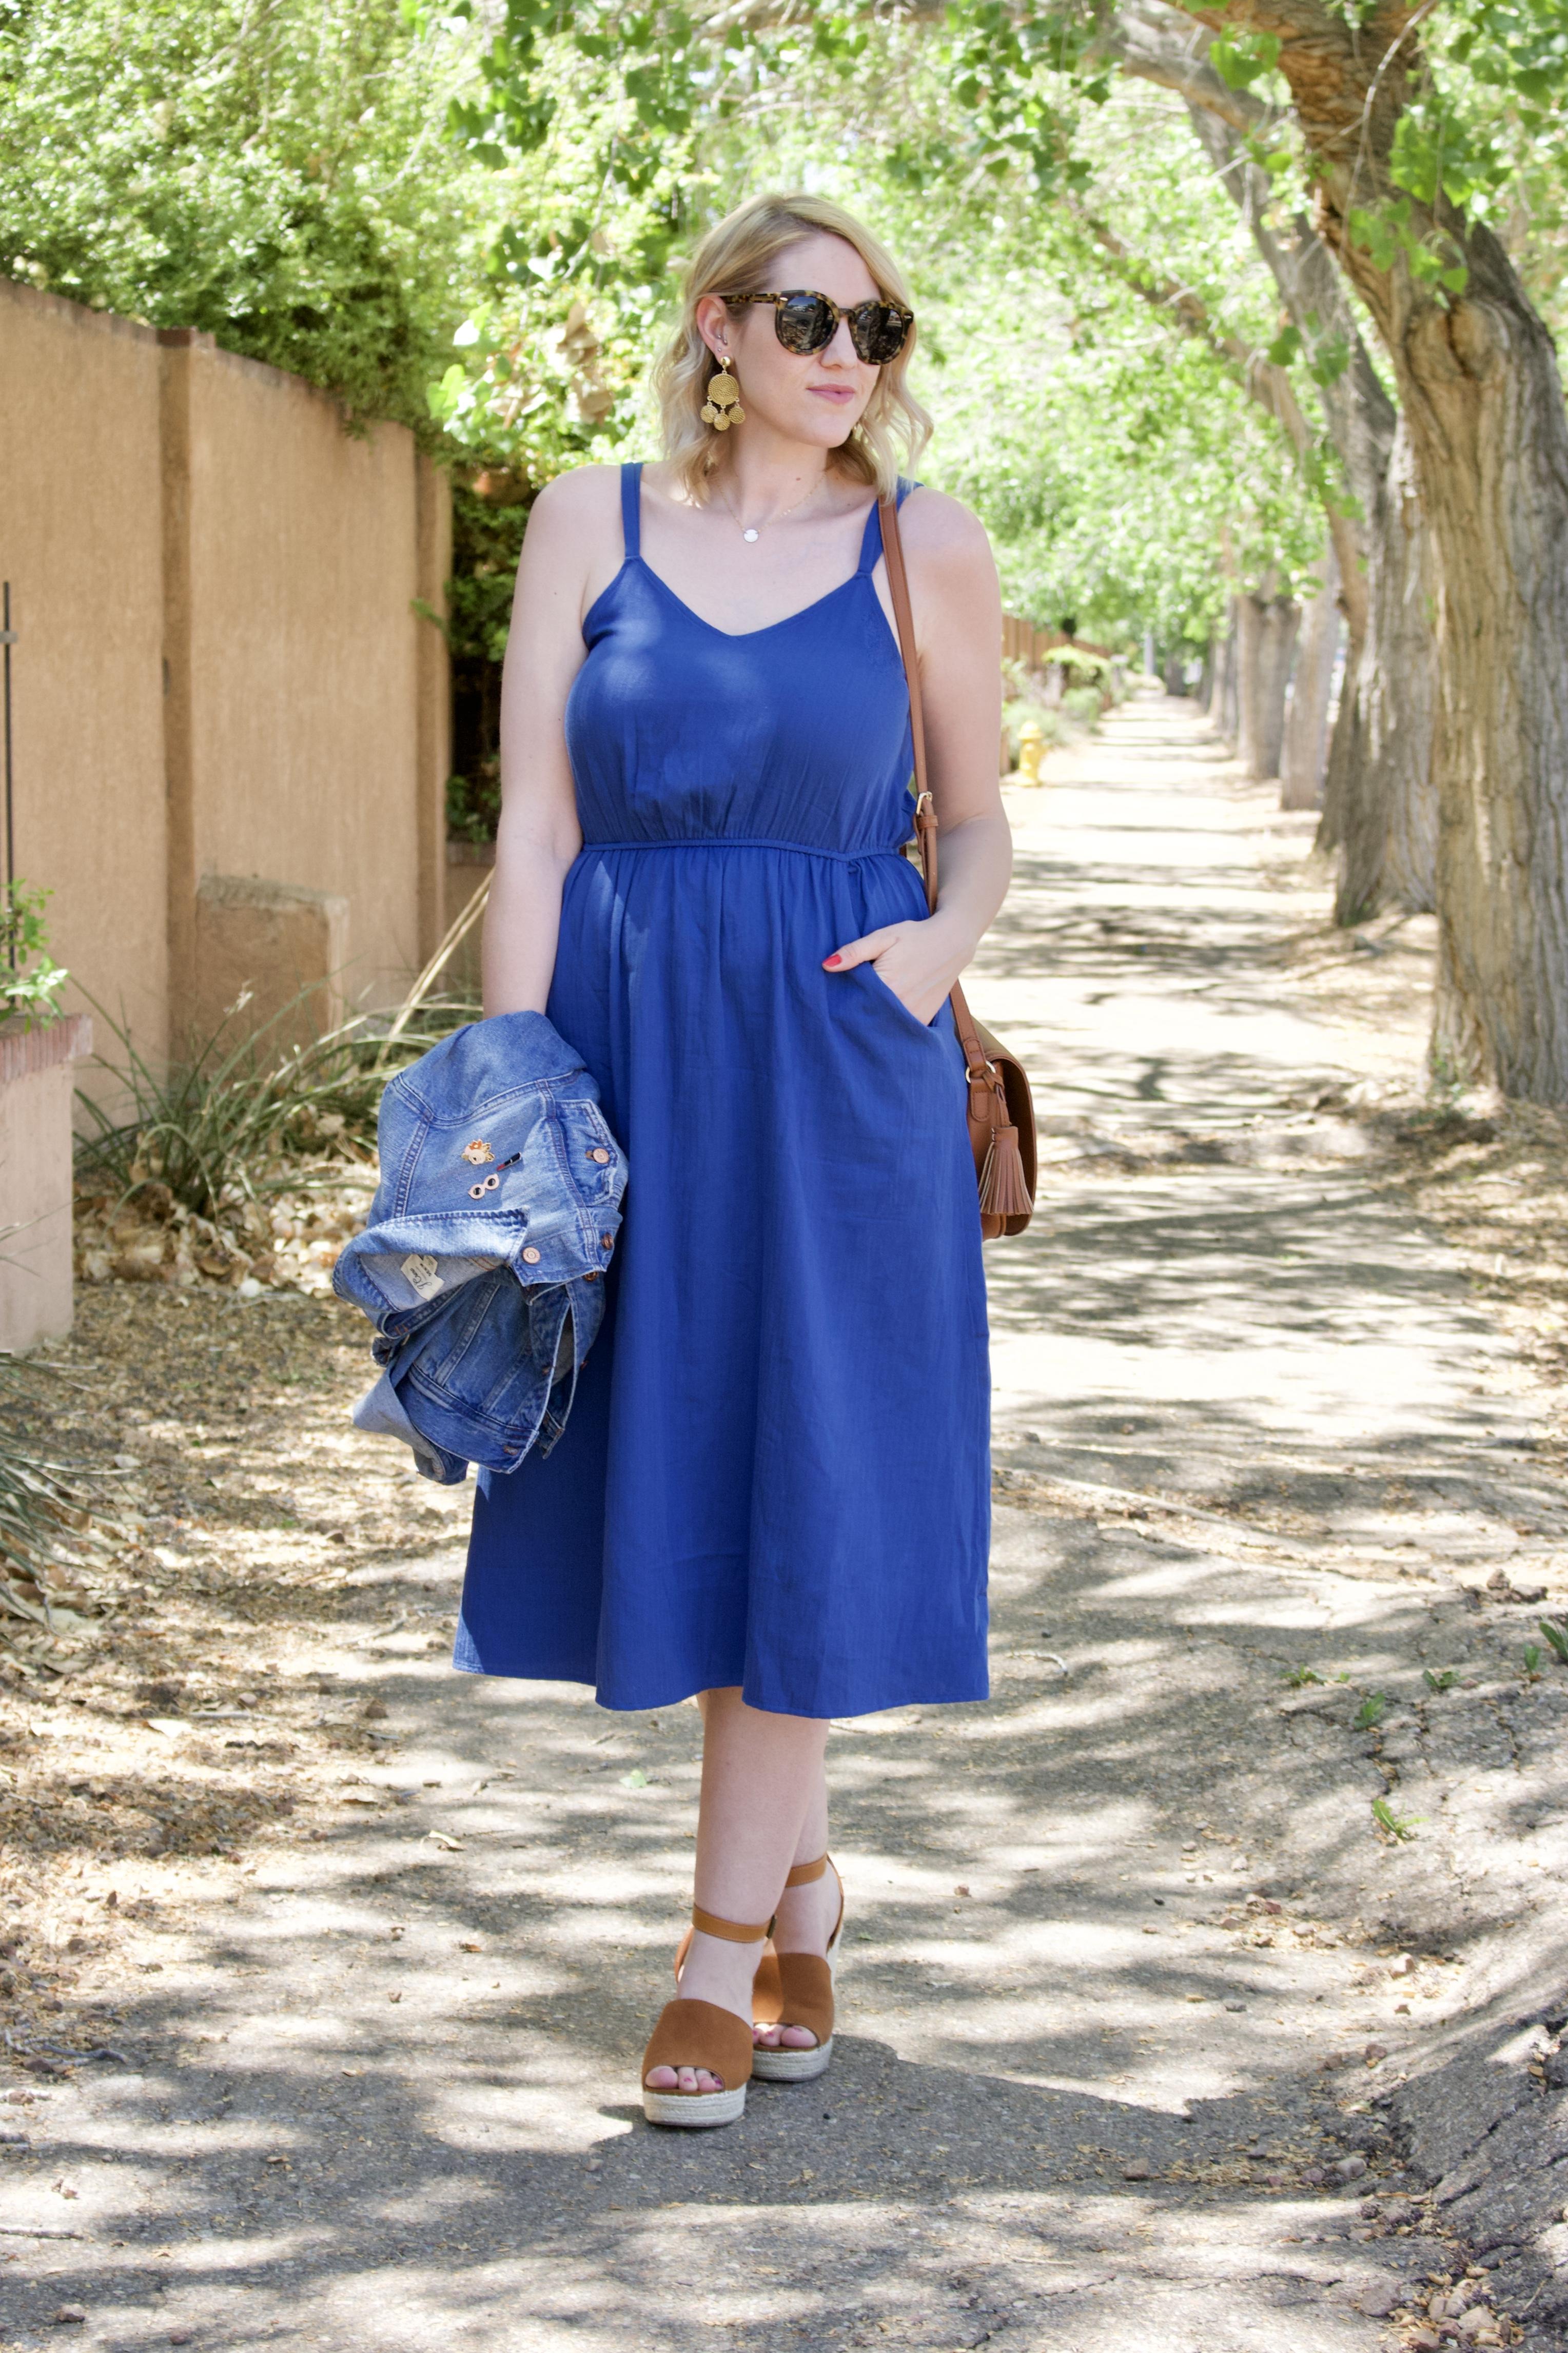 midi dress for mother's day #tallfashion #mididress #springstyle